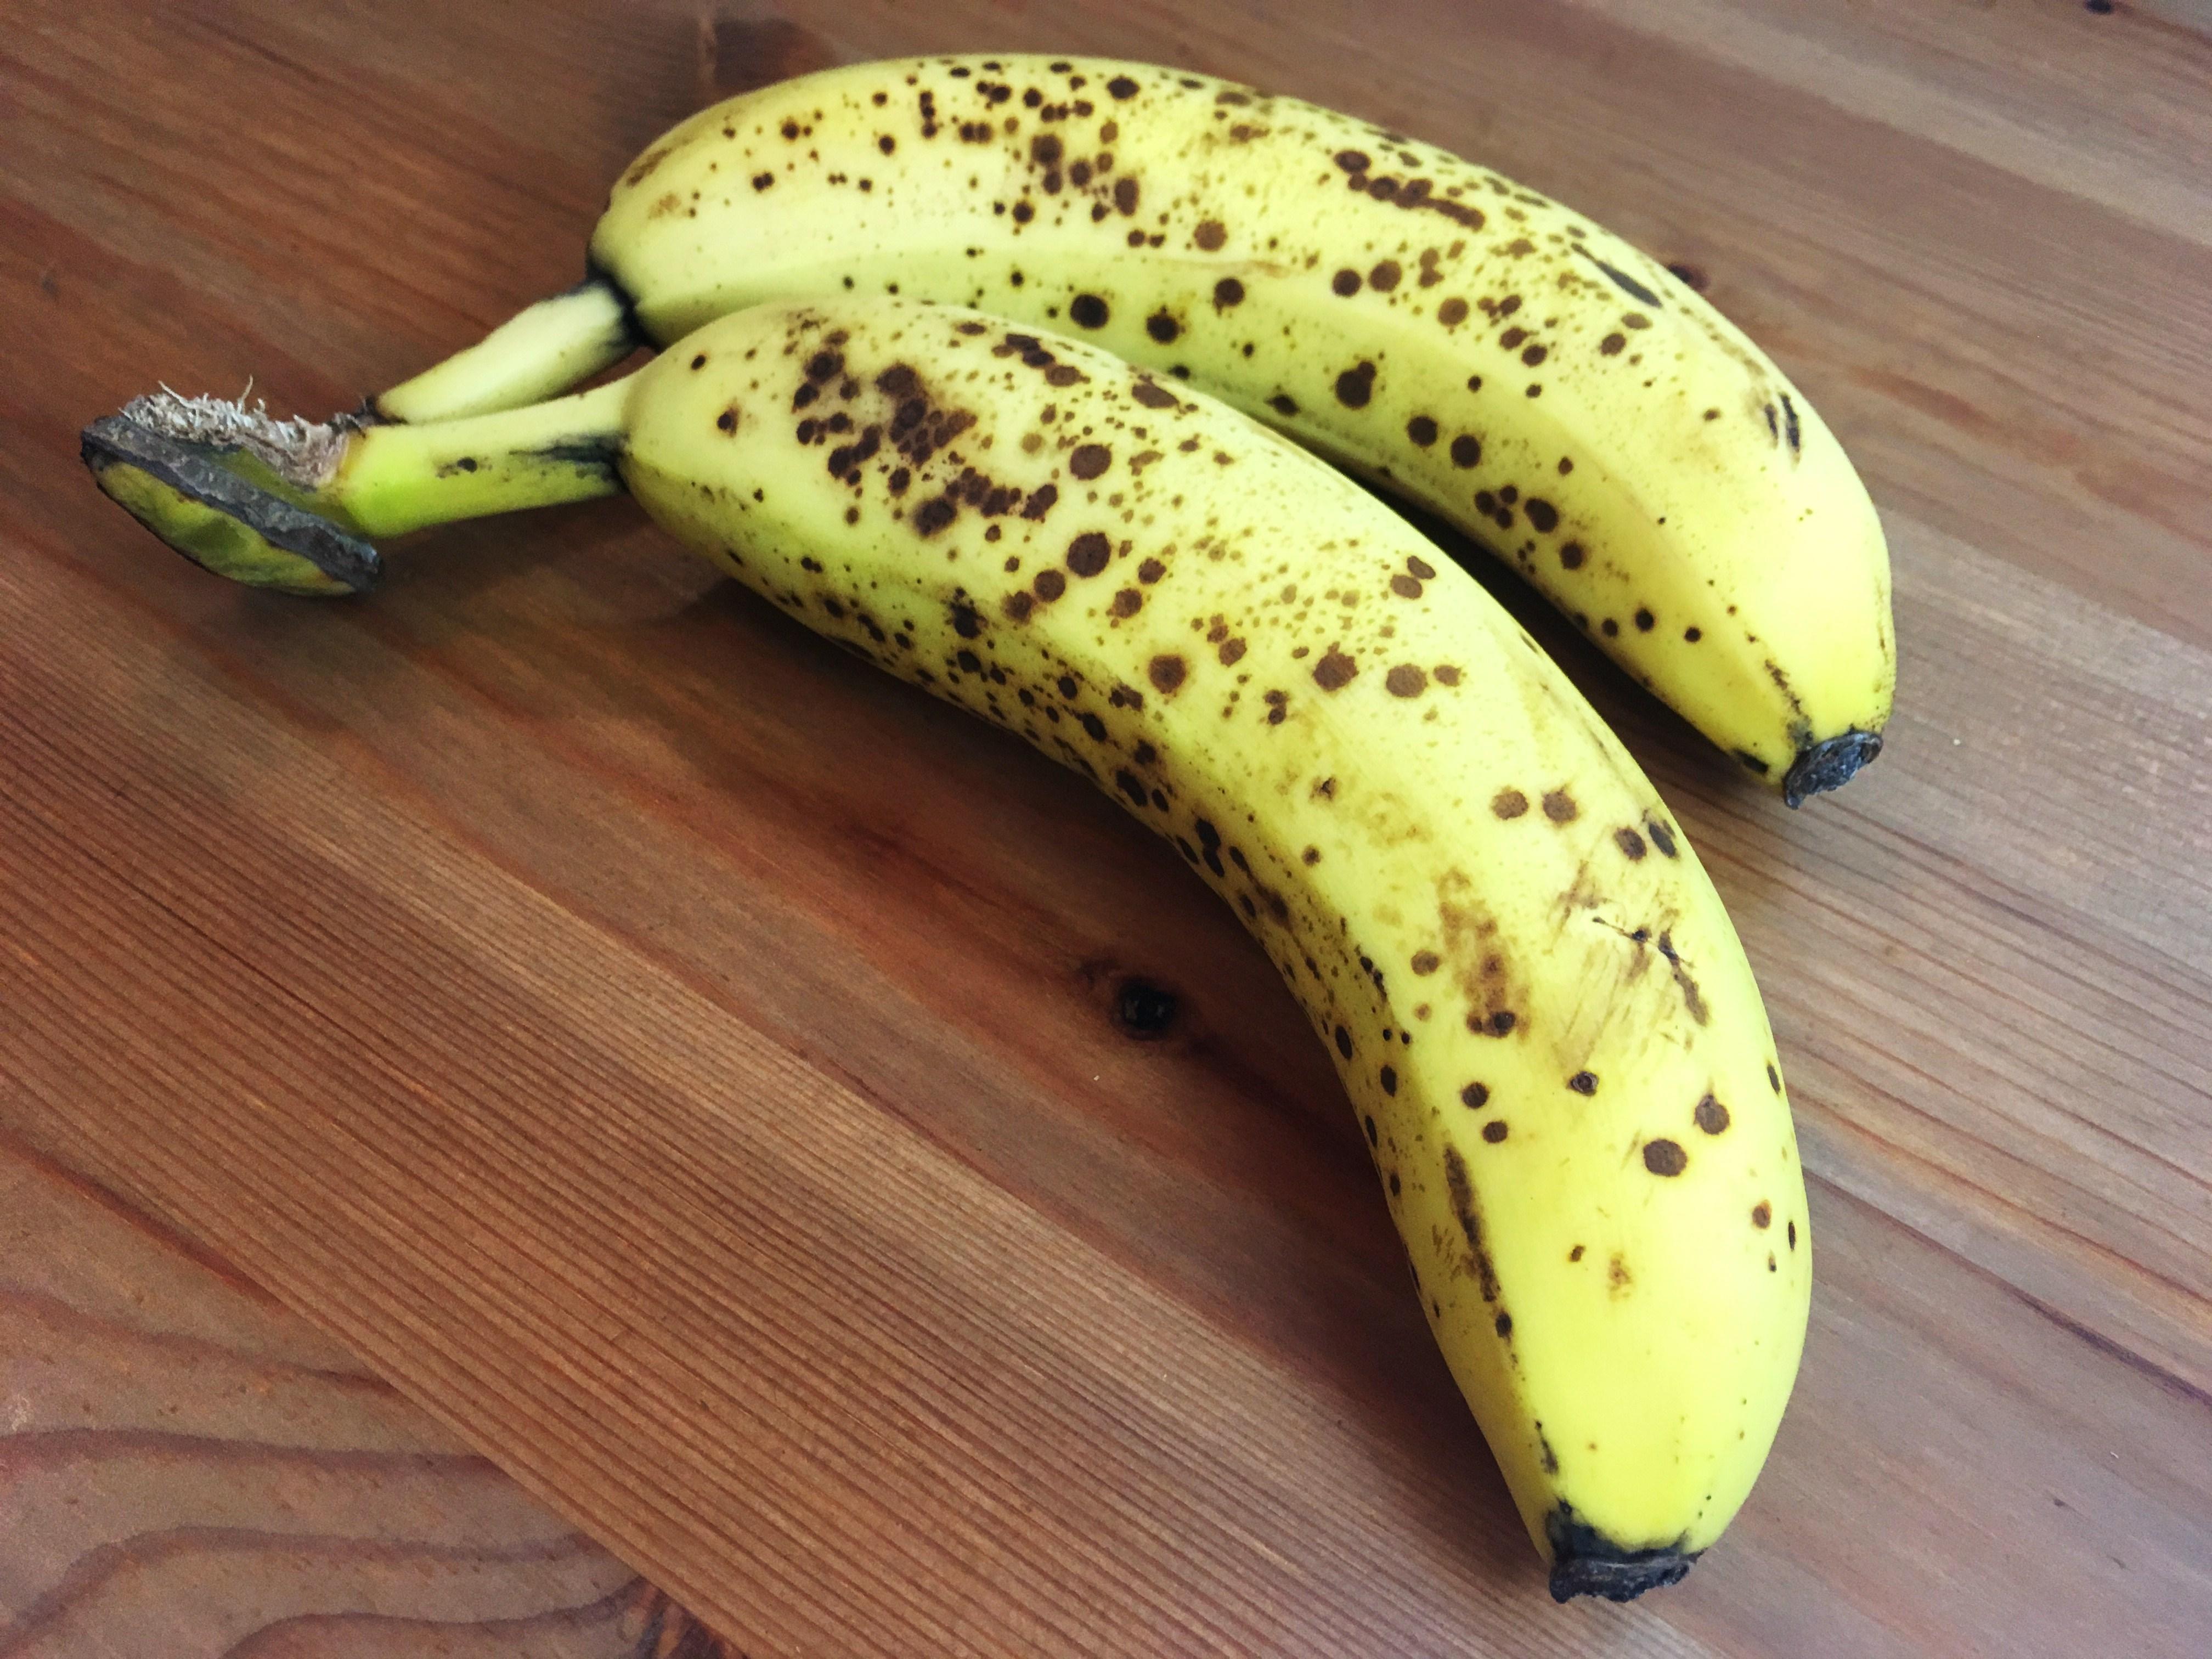 como conservar bananas - maduras